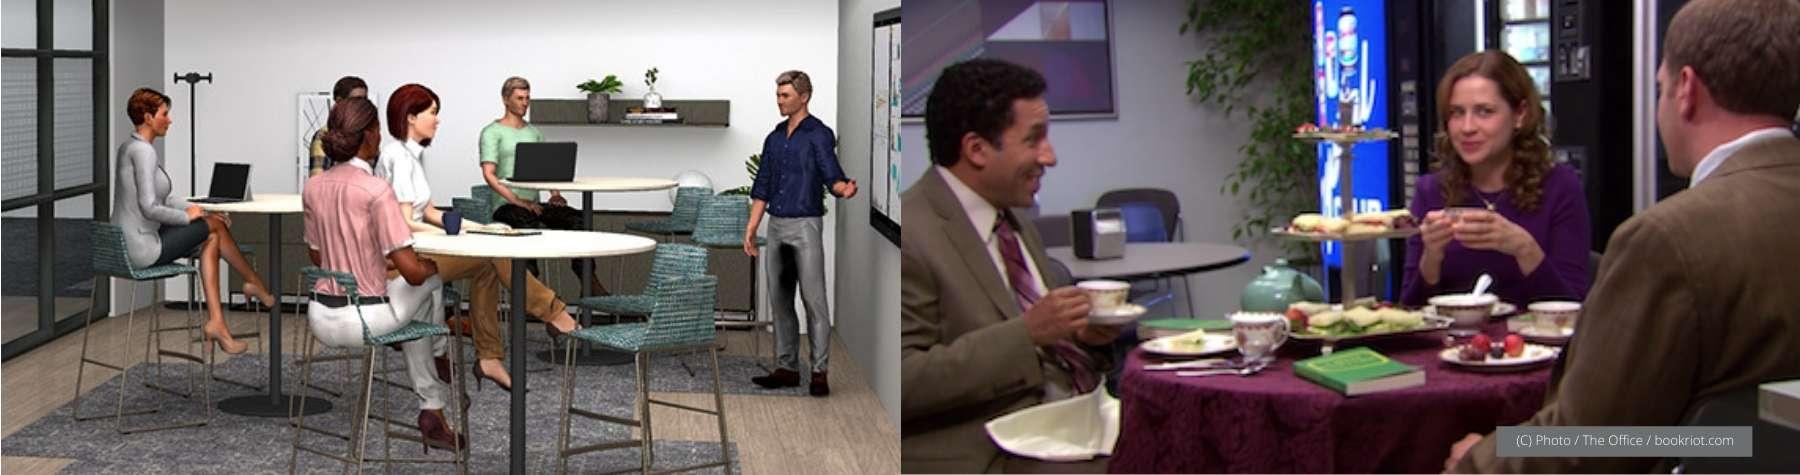 Red Thread's Flex Meeting Zone vs The Office's Break Room